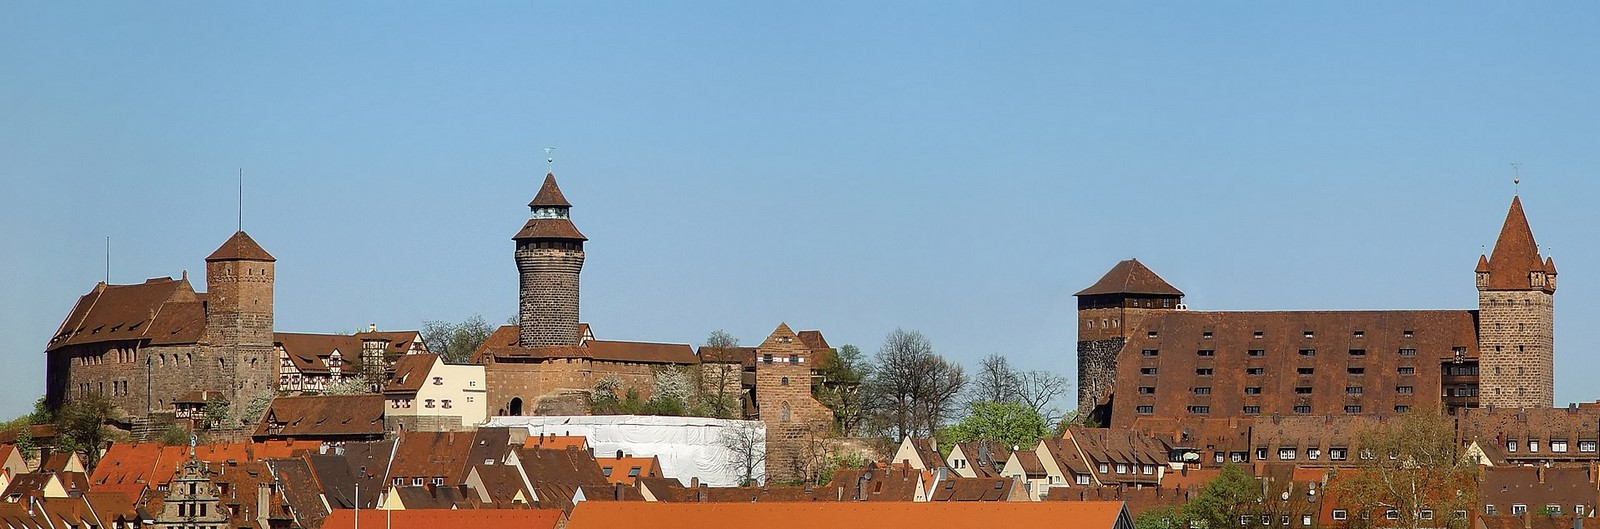 Nuremberg Castle - Sheet1